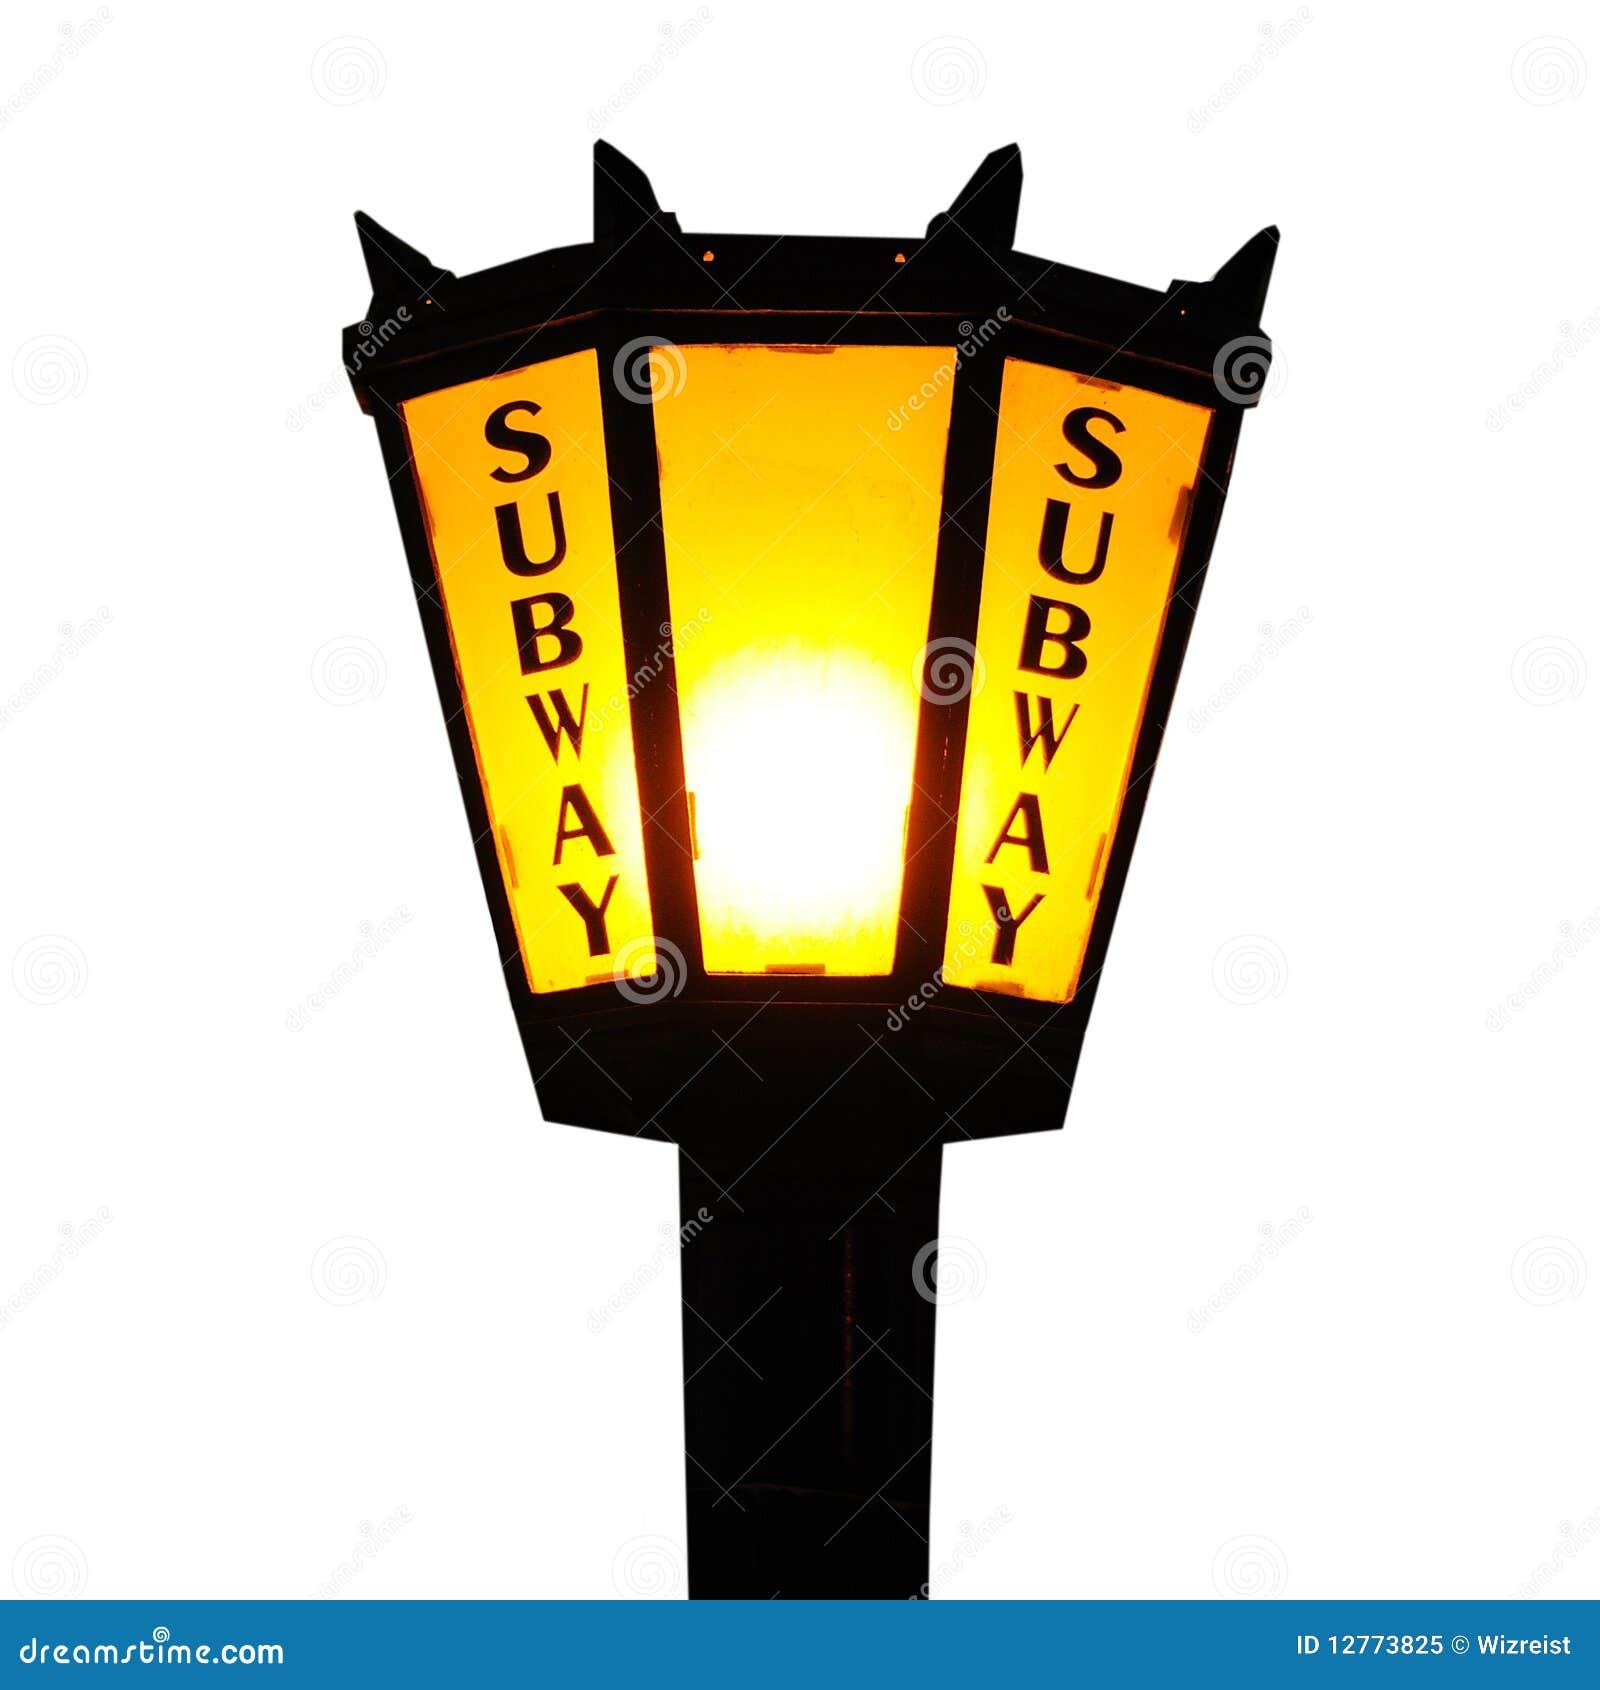 New york city subway lamp stock image image of street 12773825 new york city subway lamp biocorpaavc Gallery